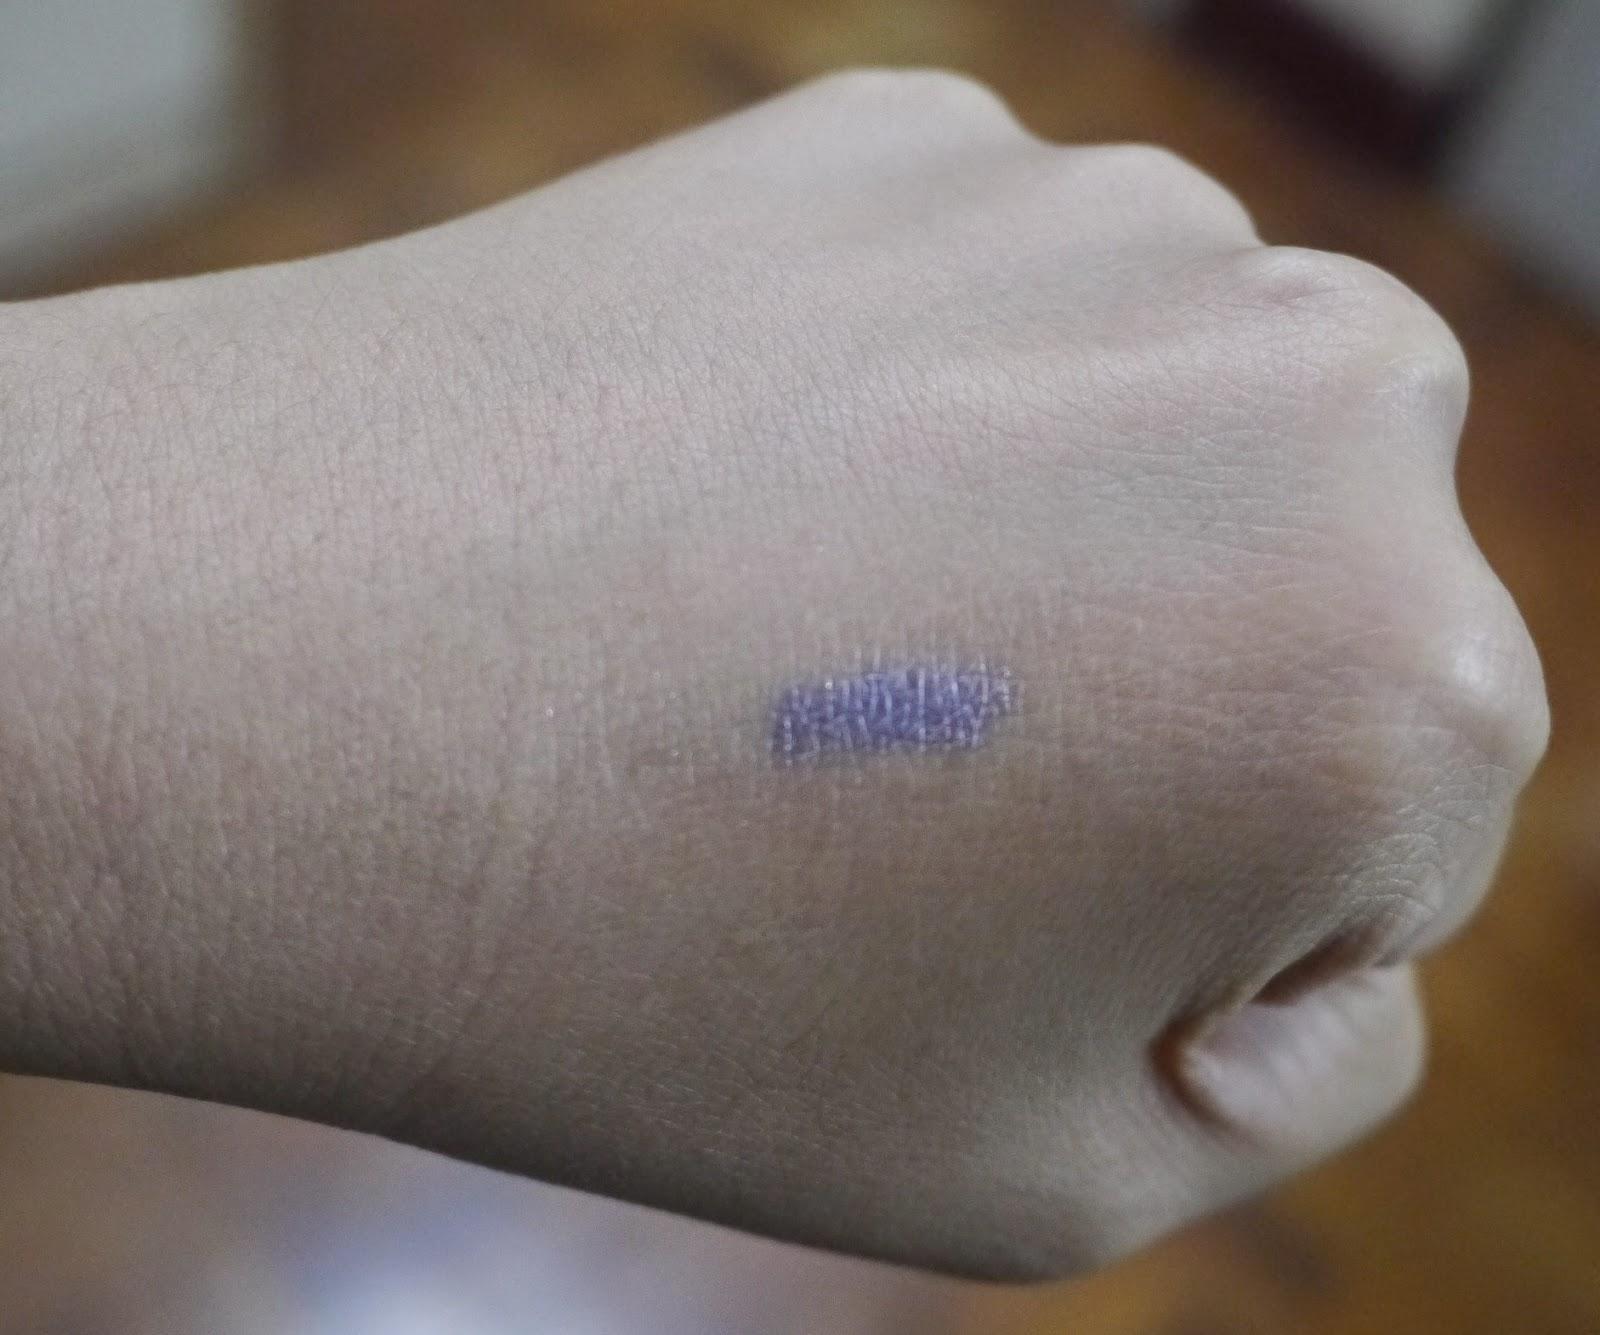 Katch My Drift Lavender Eyeliner Essence Kajal Pencil In Darling Will I Repurchase